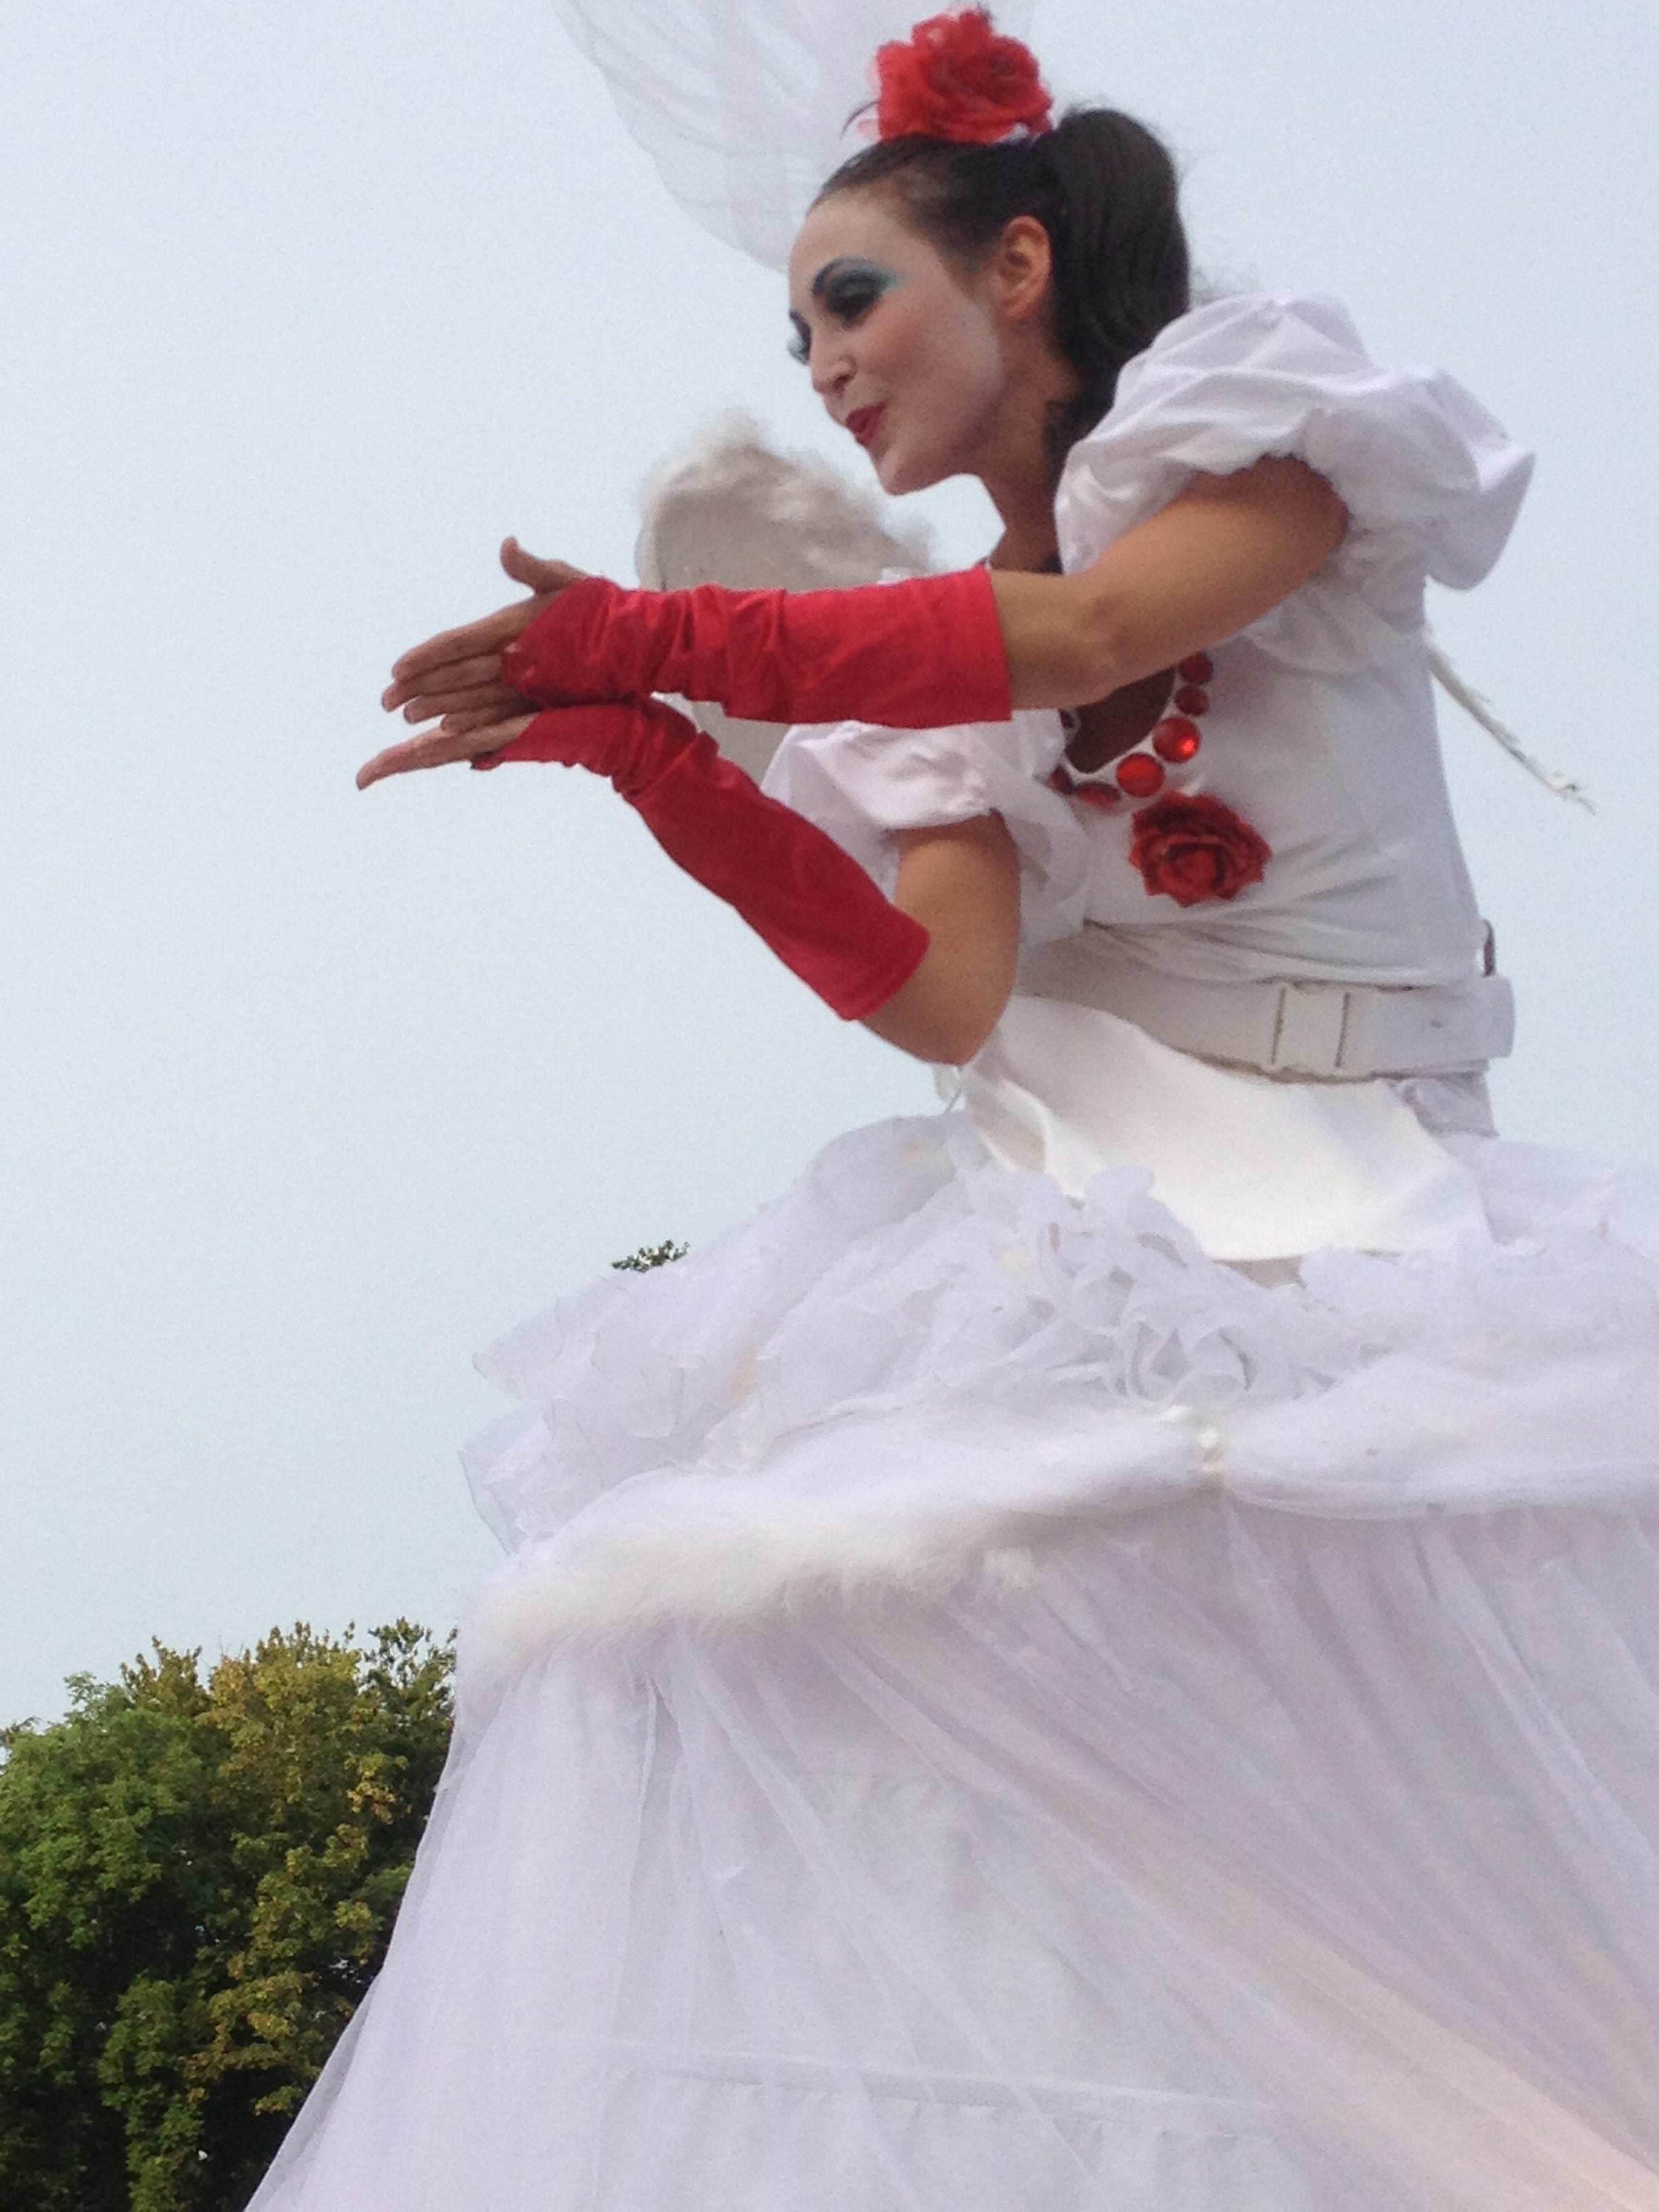 Parade van de Zomerkoning, Paleis het Loo